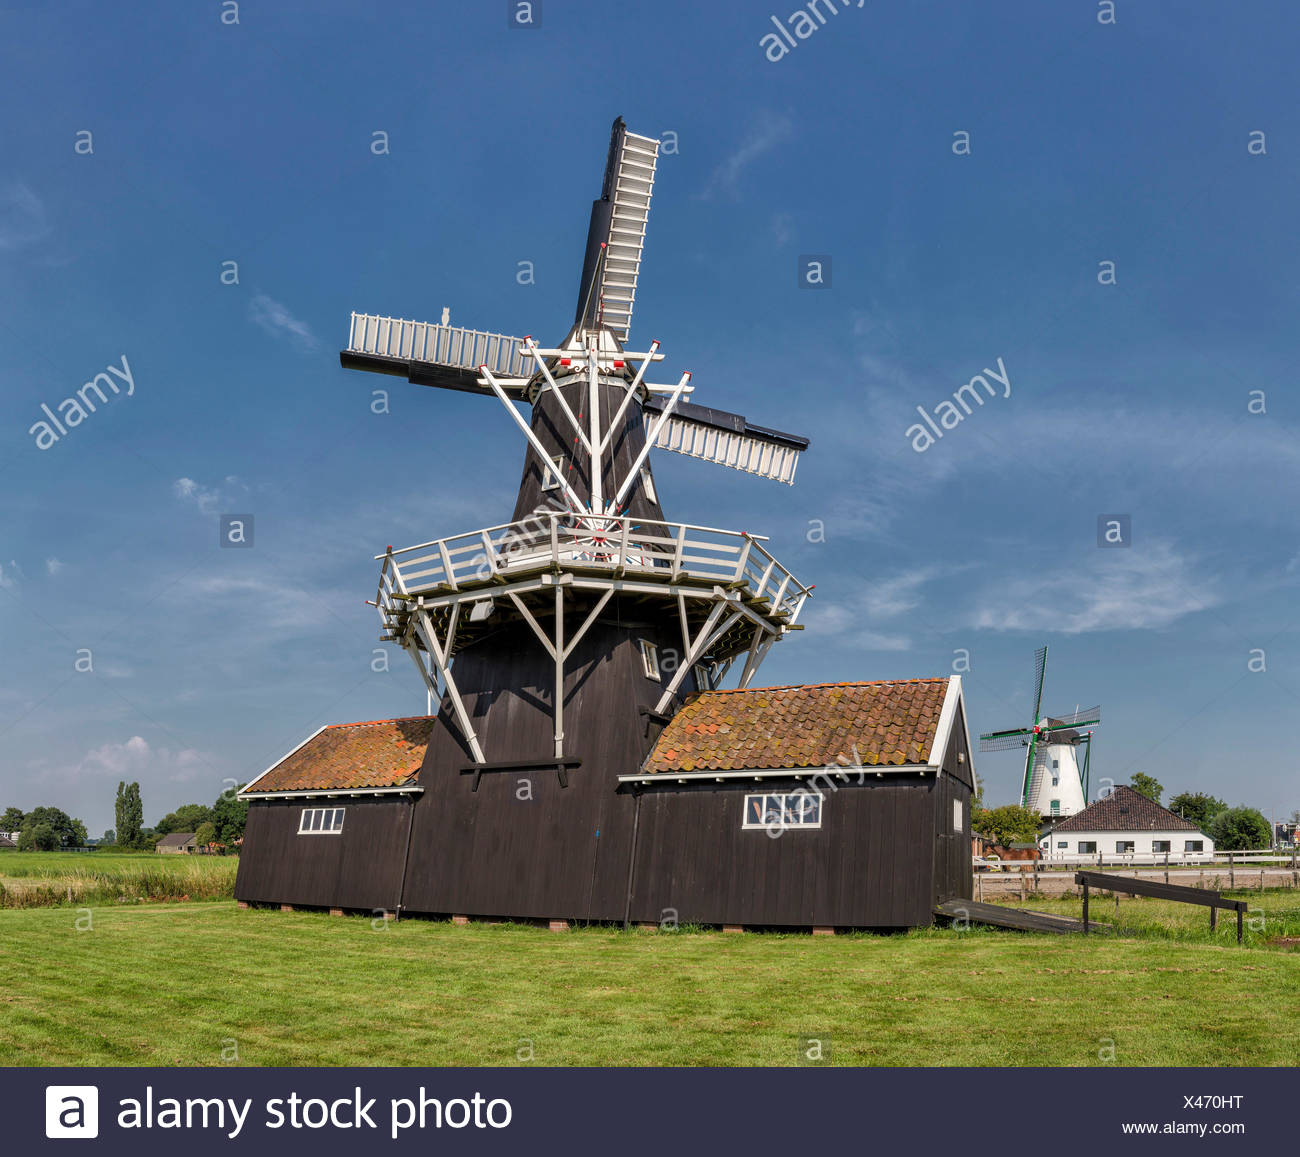 Netherlands, Europe, Holland, Ten Boer, Groningen, windmill, summer, Bovenrijge, Widde Meuln - Stock Image